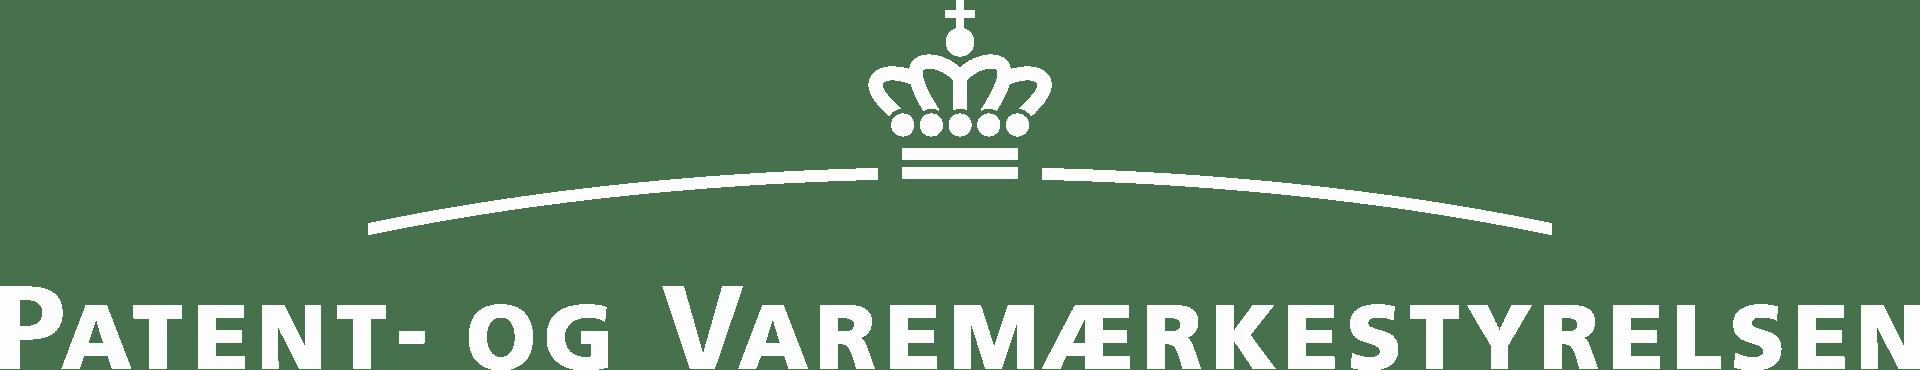 slider-logo-image